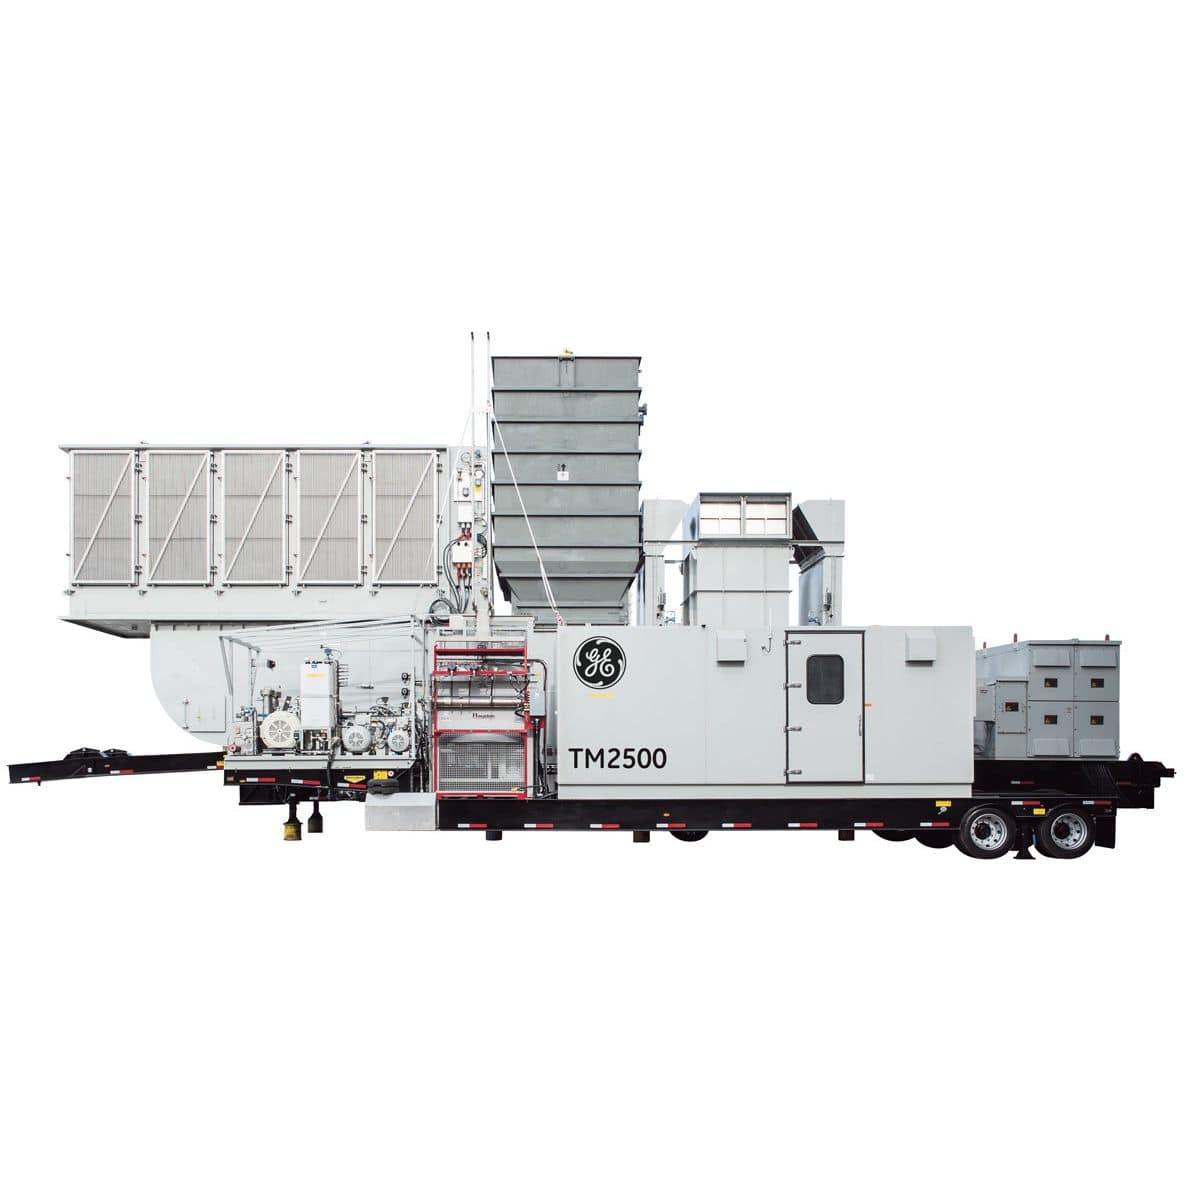 25 MW 2013 Refurbished GE TM2500 Natural Gas Turbine